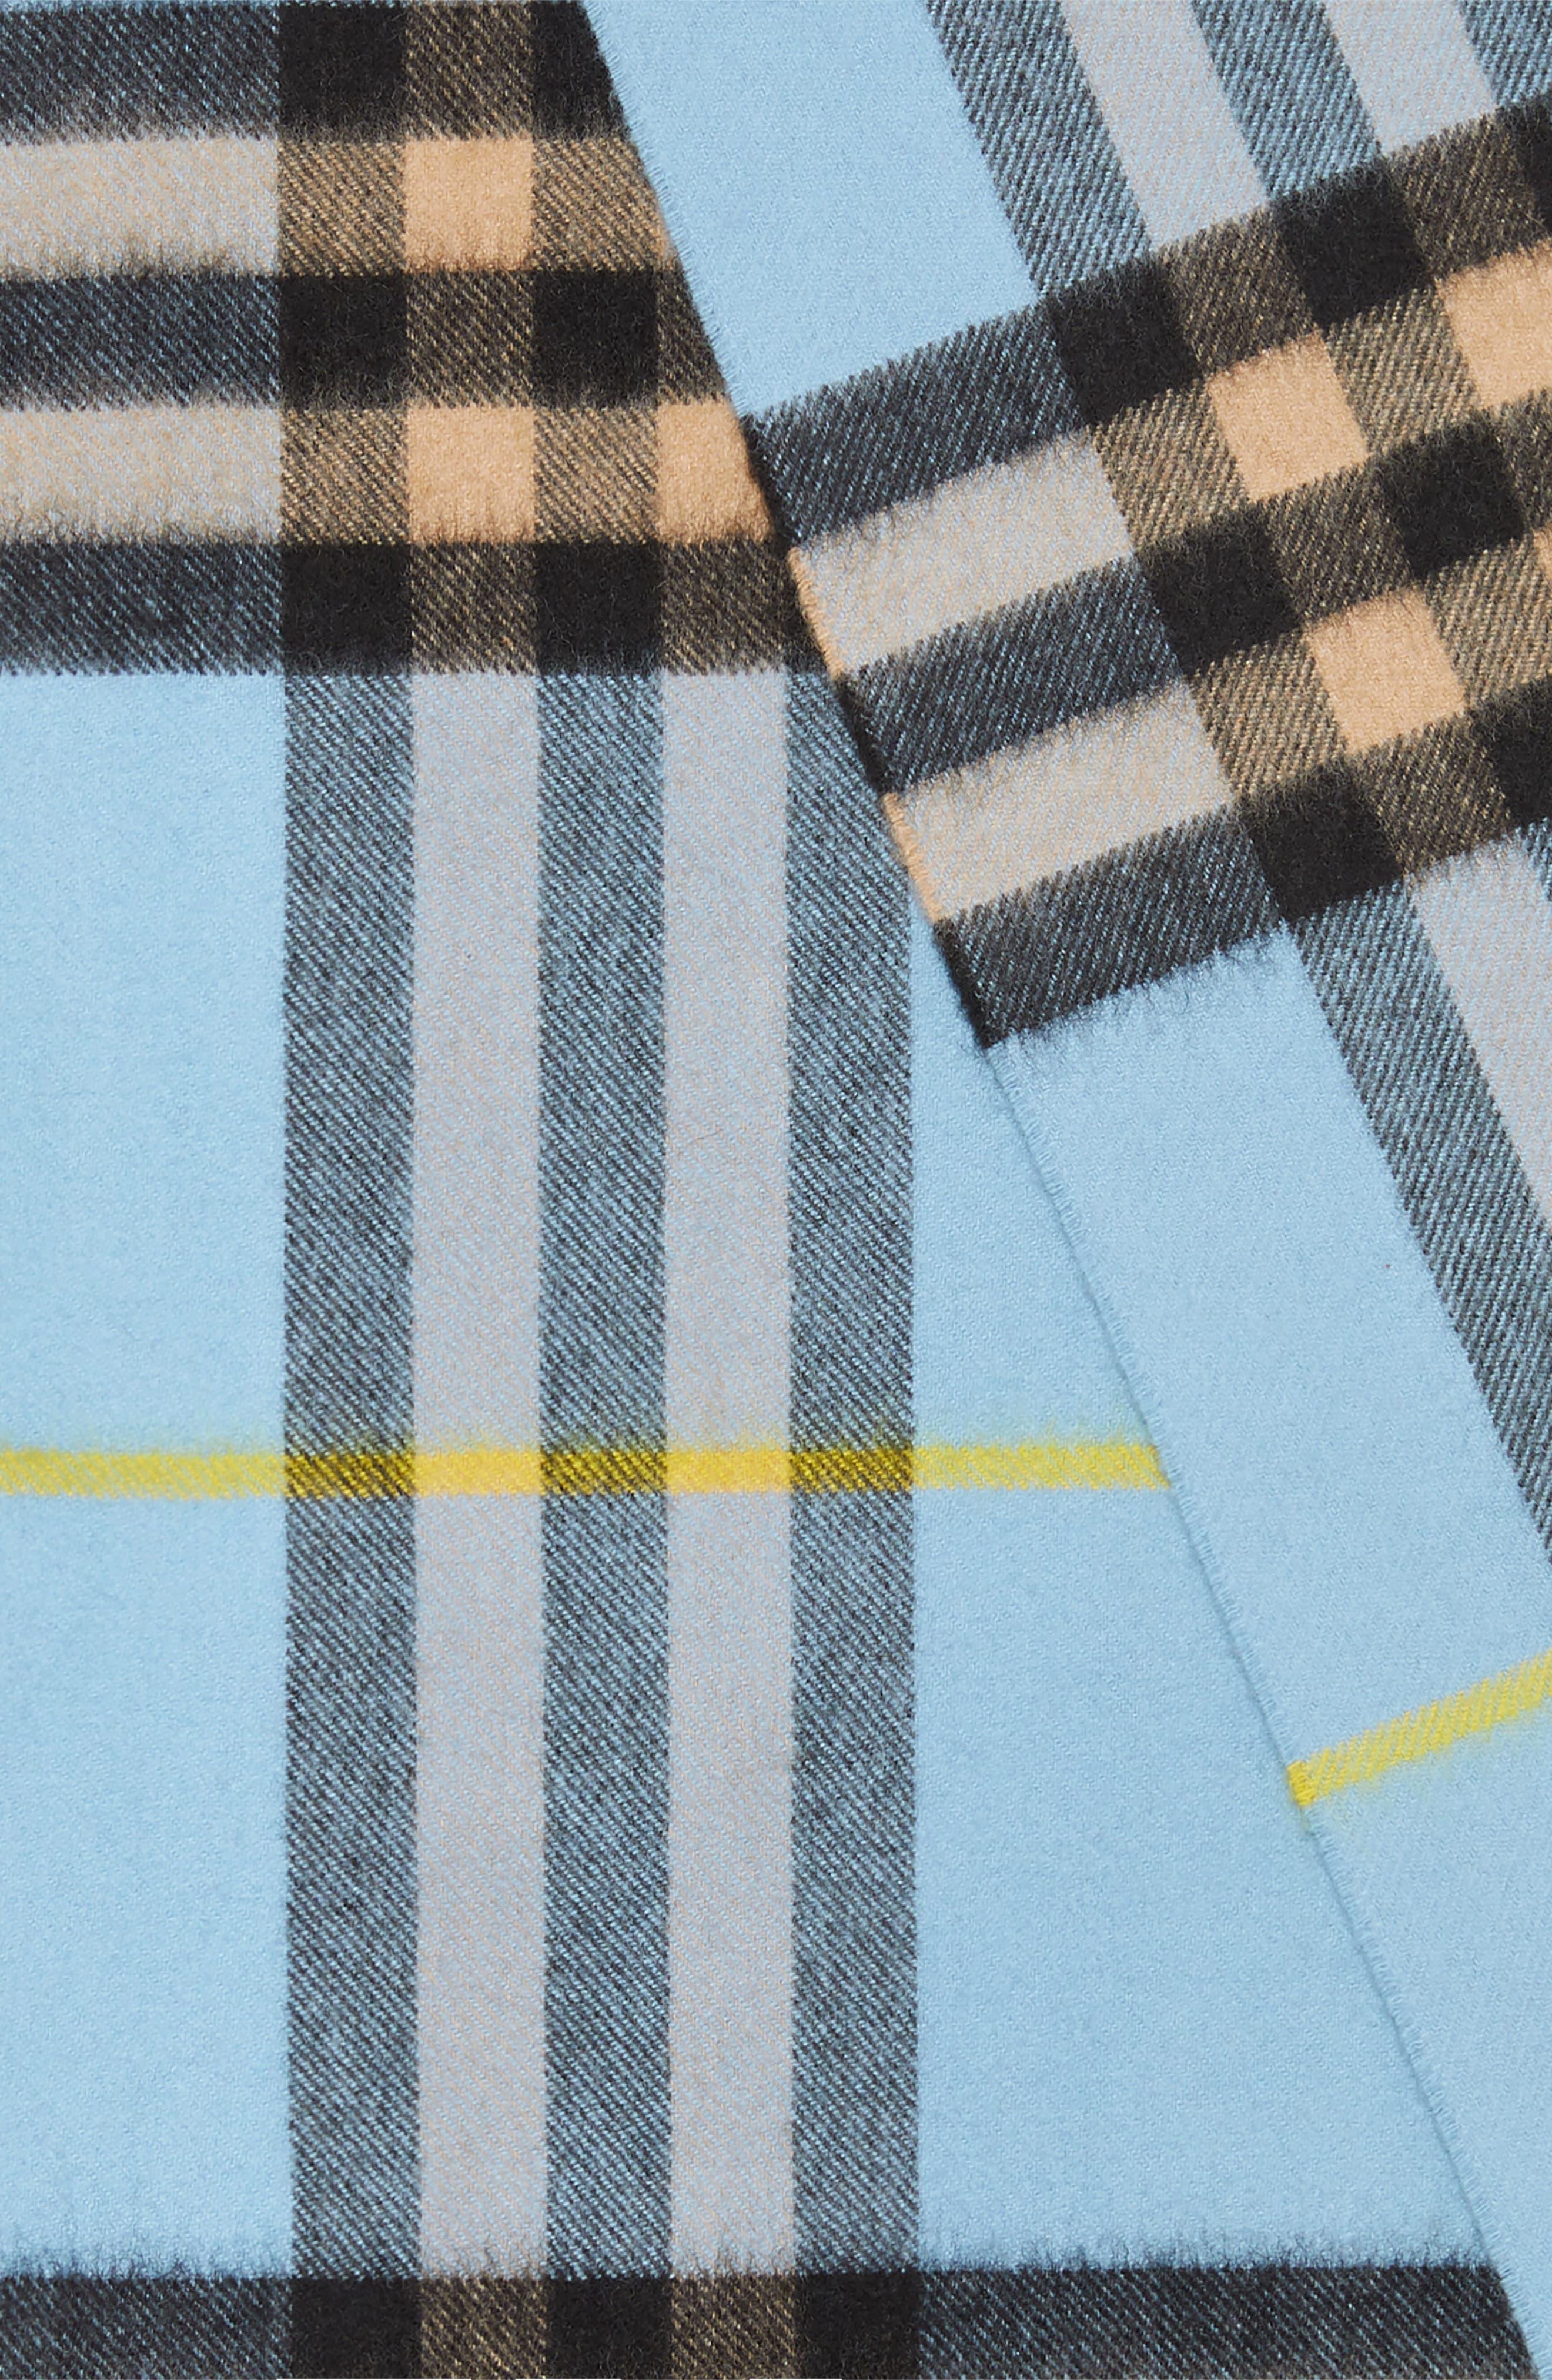 Giant Check Cashmere Scarf,                             Alternate thumbnail 2, color,                             BLUE CARBON